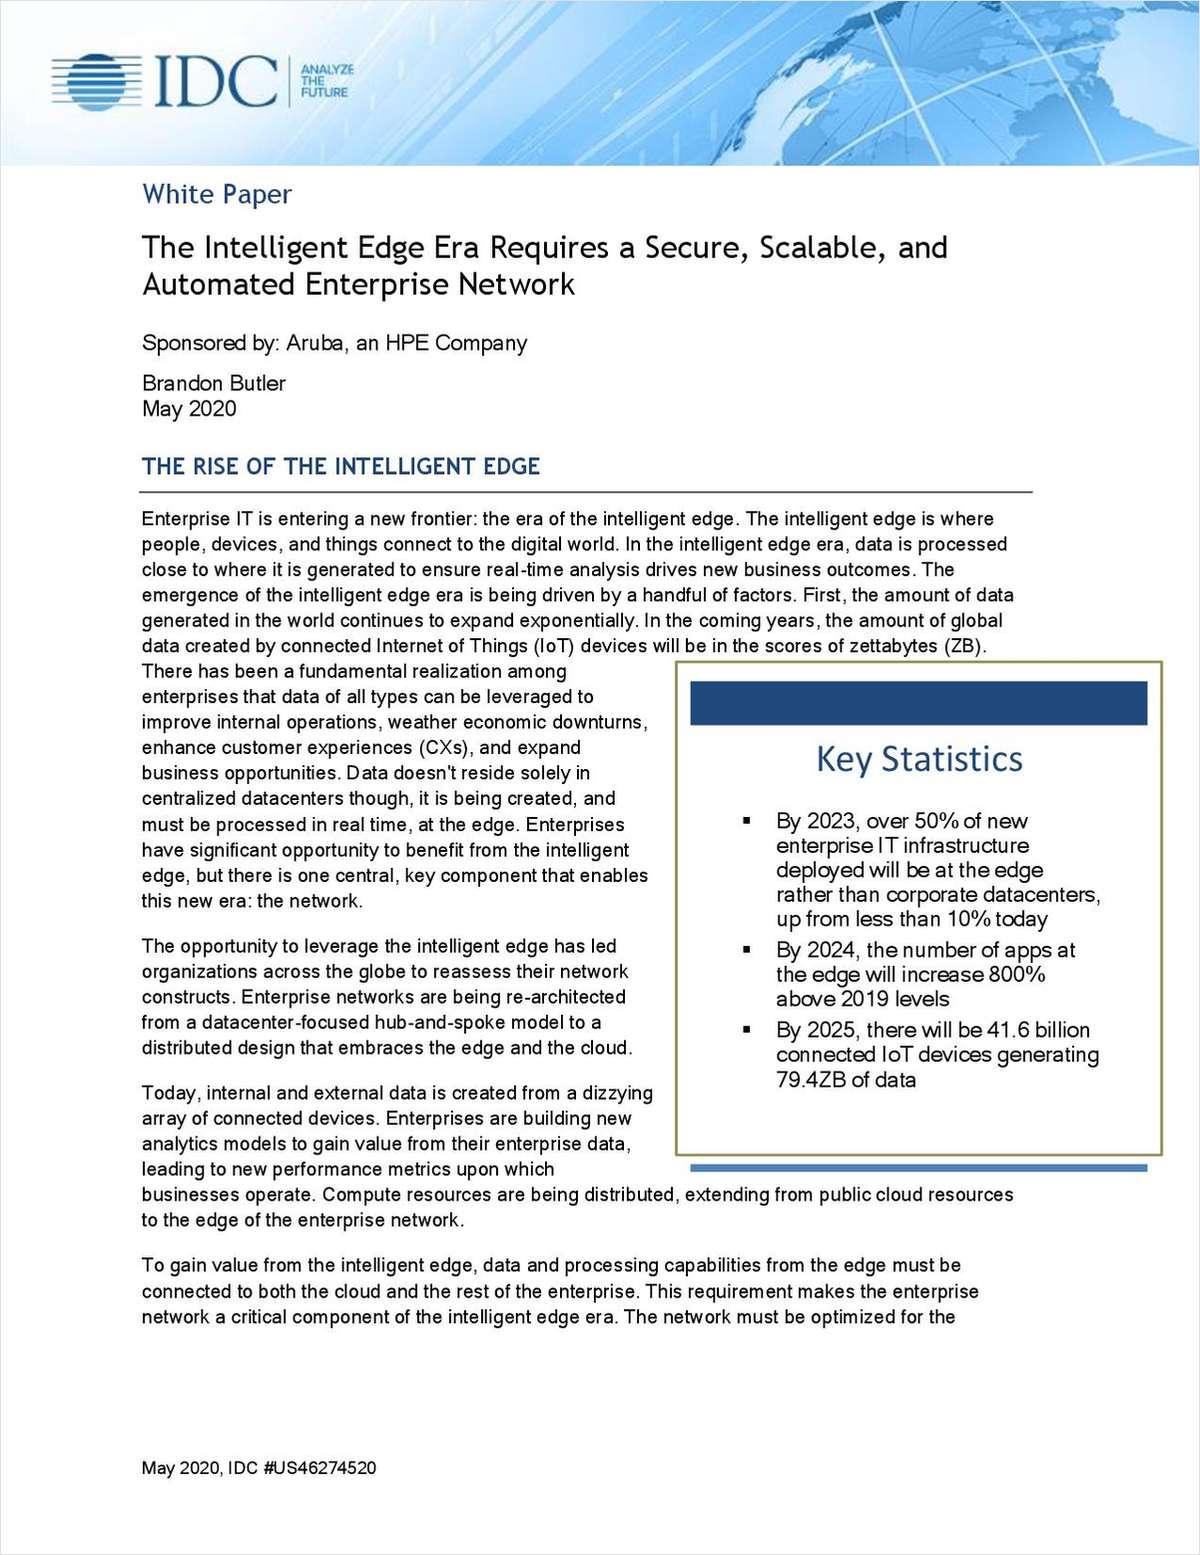 IDC Whitepaper: The Dawn of the Intelligent Edge Era